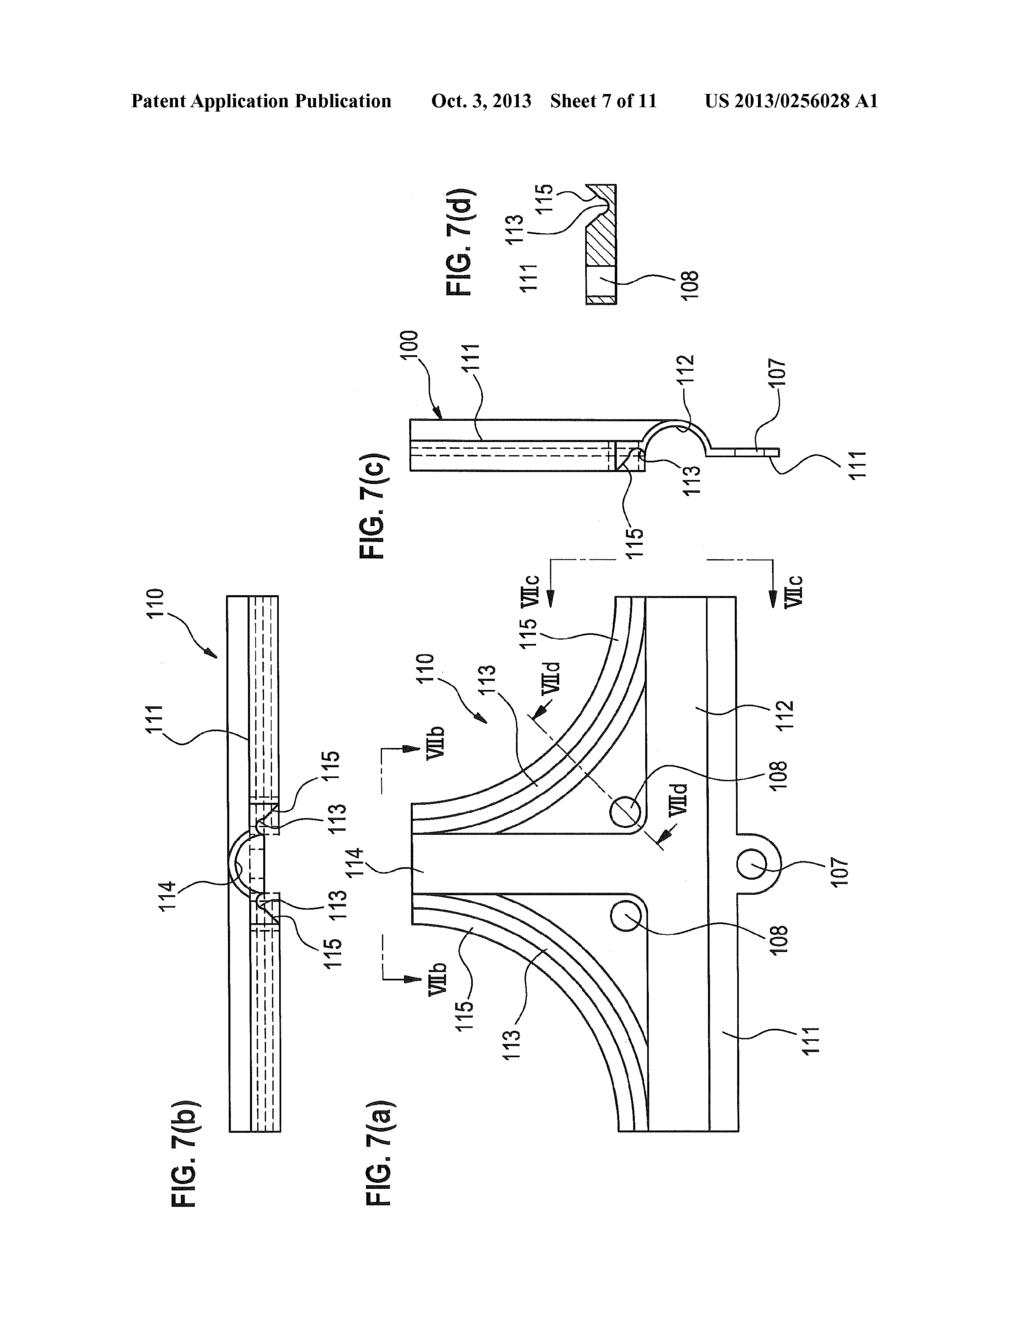 hight resolution of coleman evcon wiring diagram dgaa077bdtb auto electrical wiringevcon dgat070bdd furnace wiring diagram coleman mach